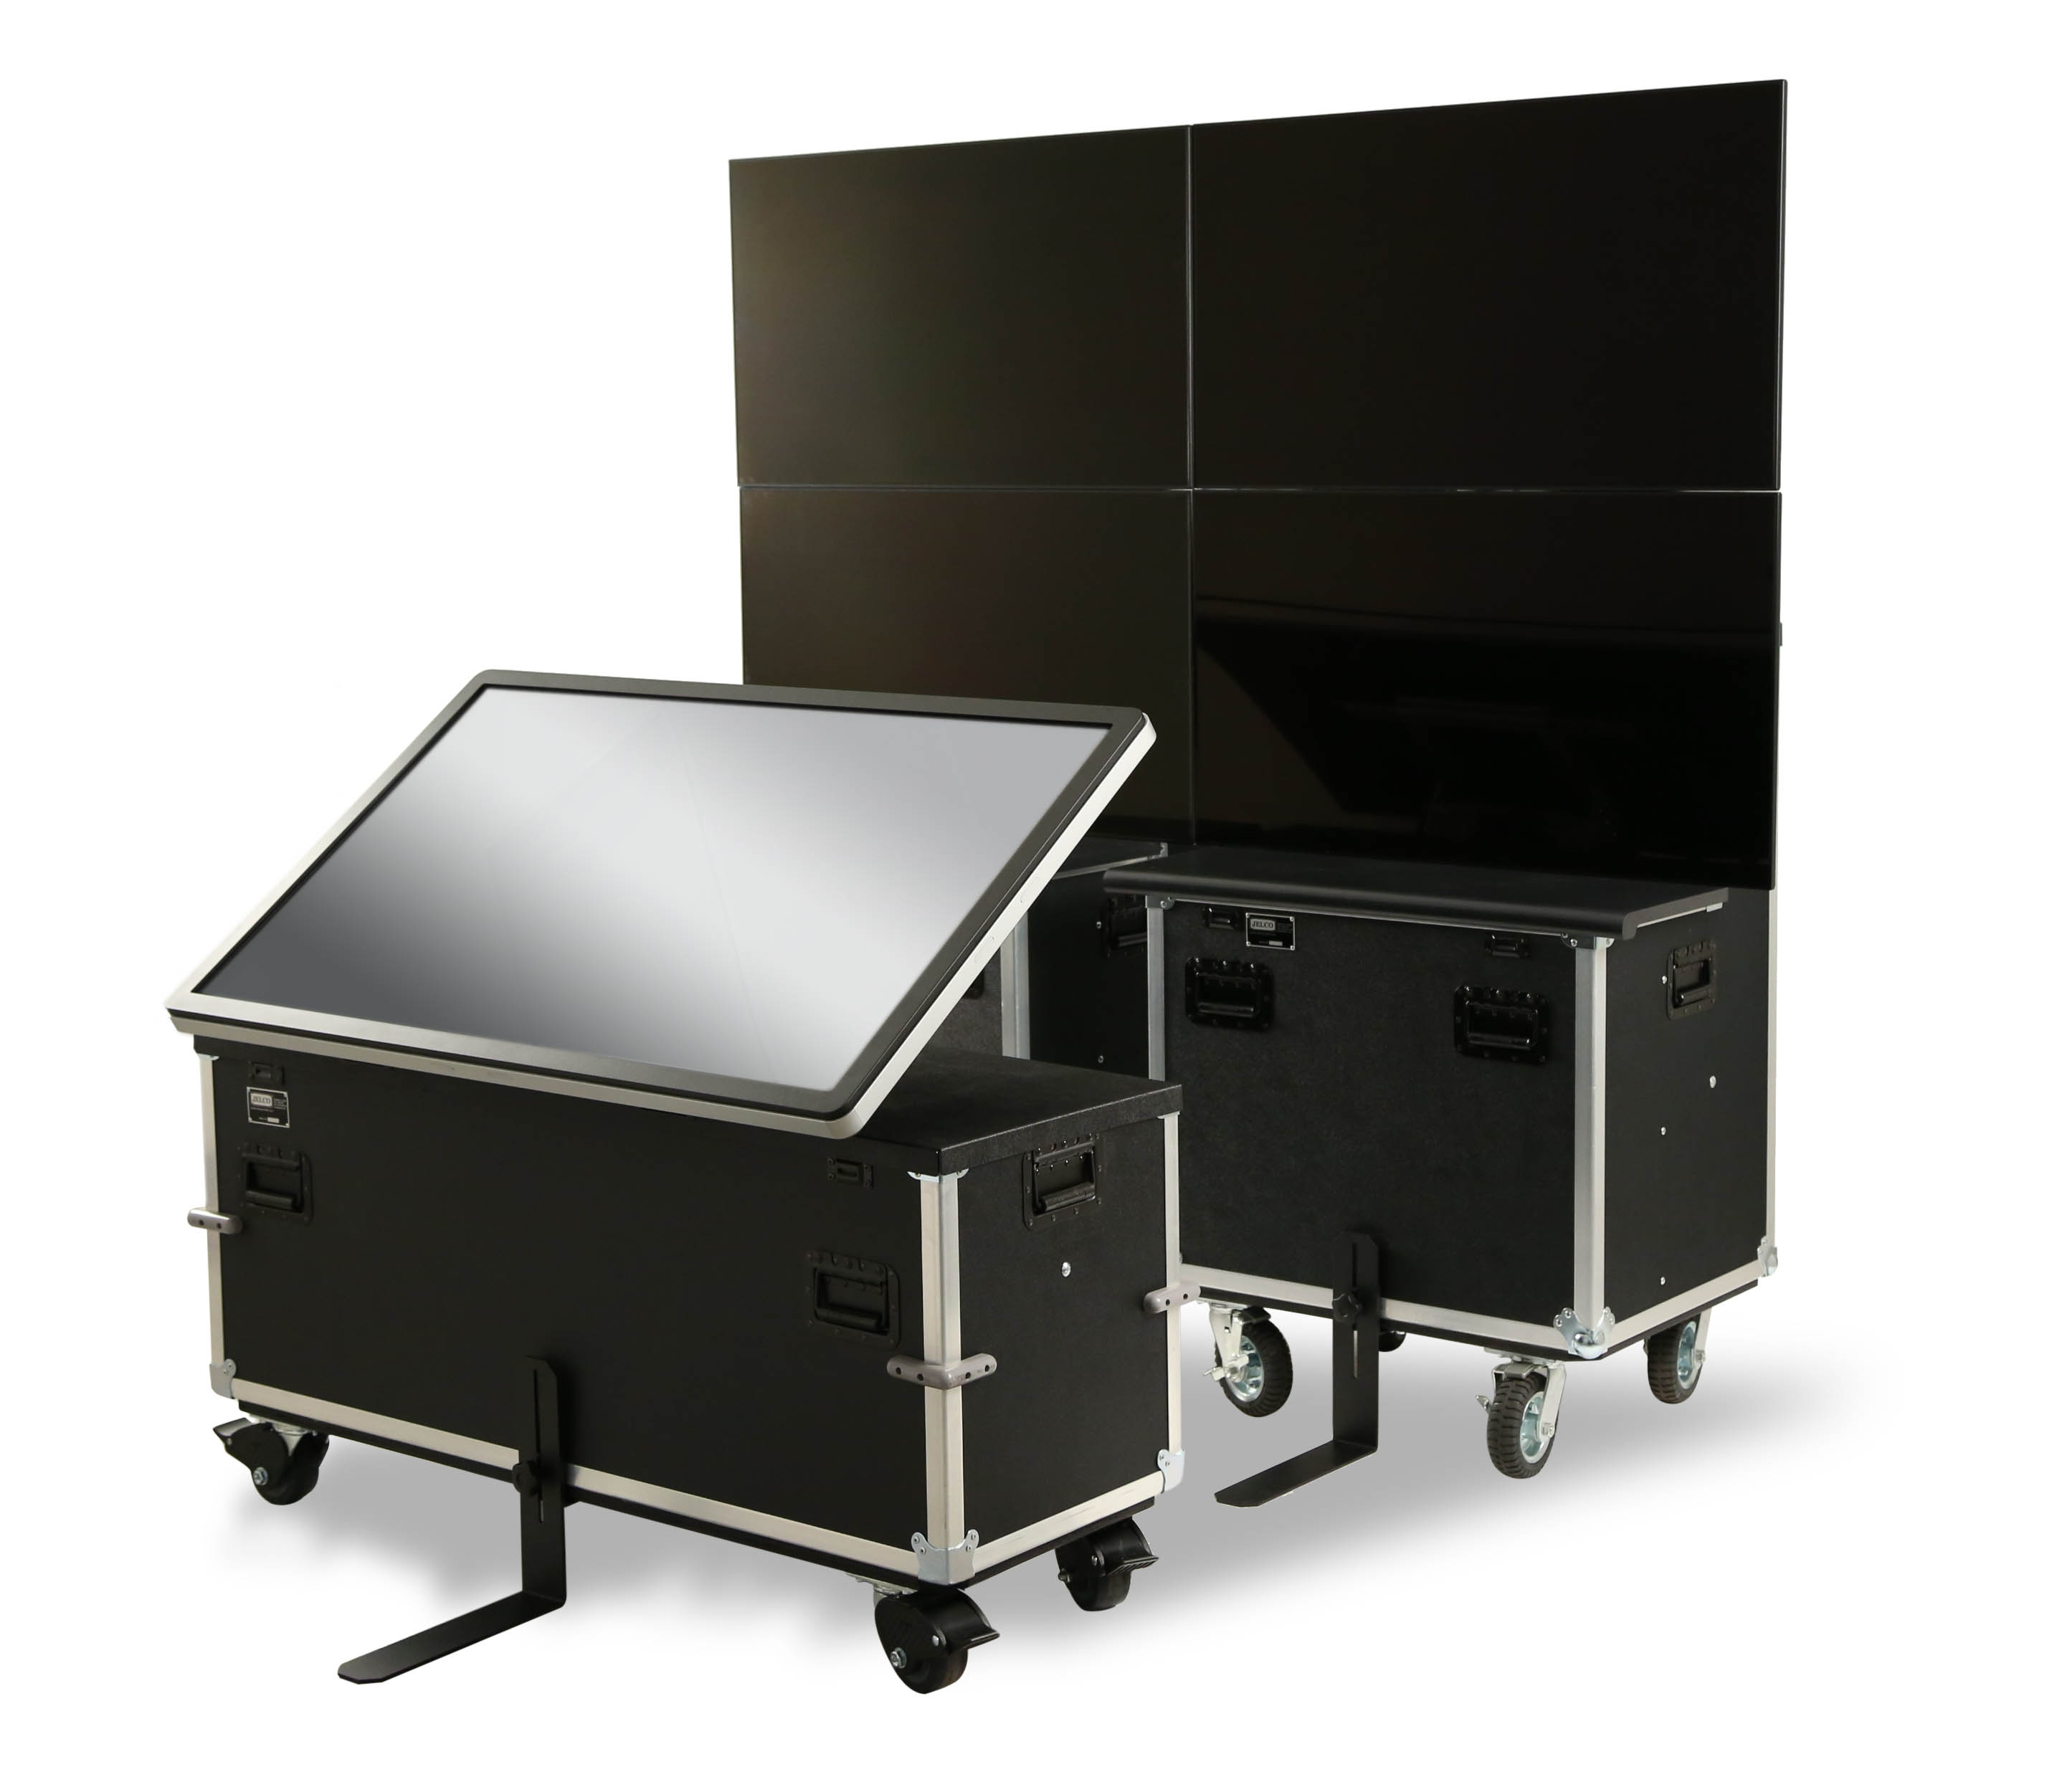 rotolift-dual-and-tilt-table.jpg